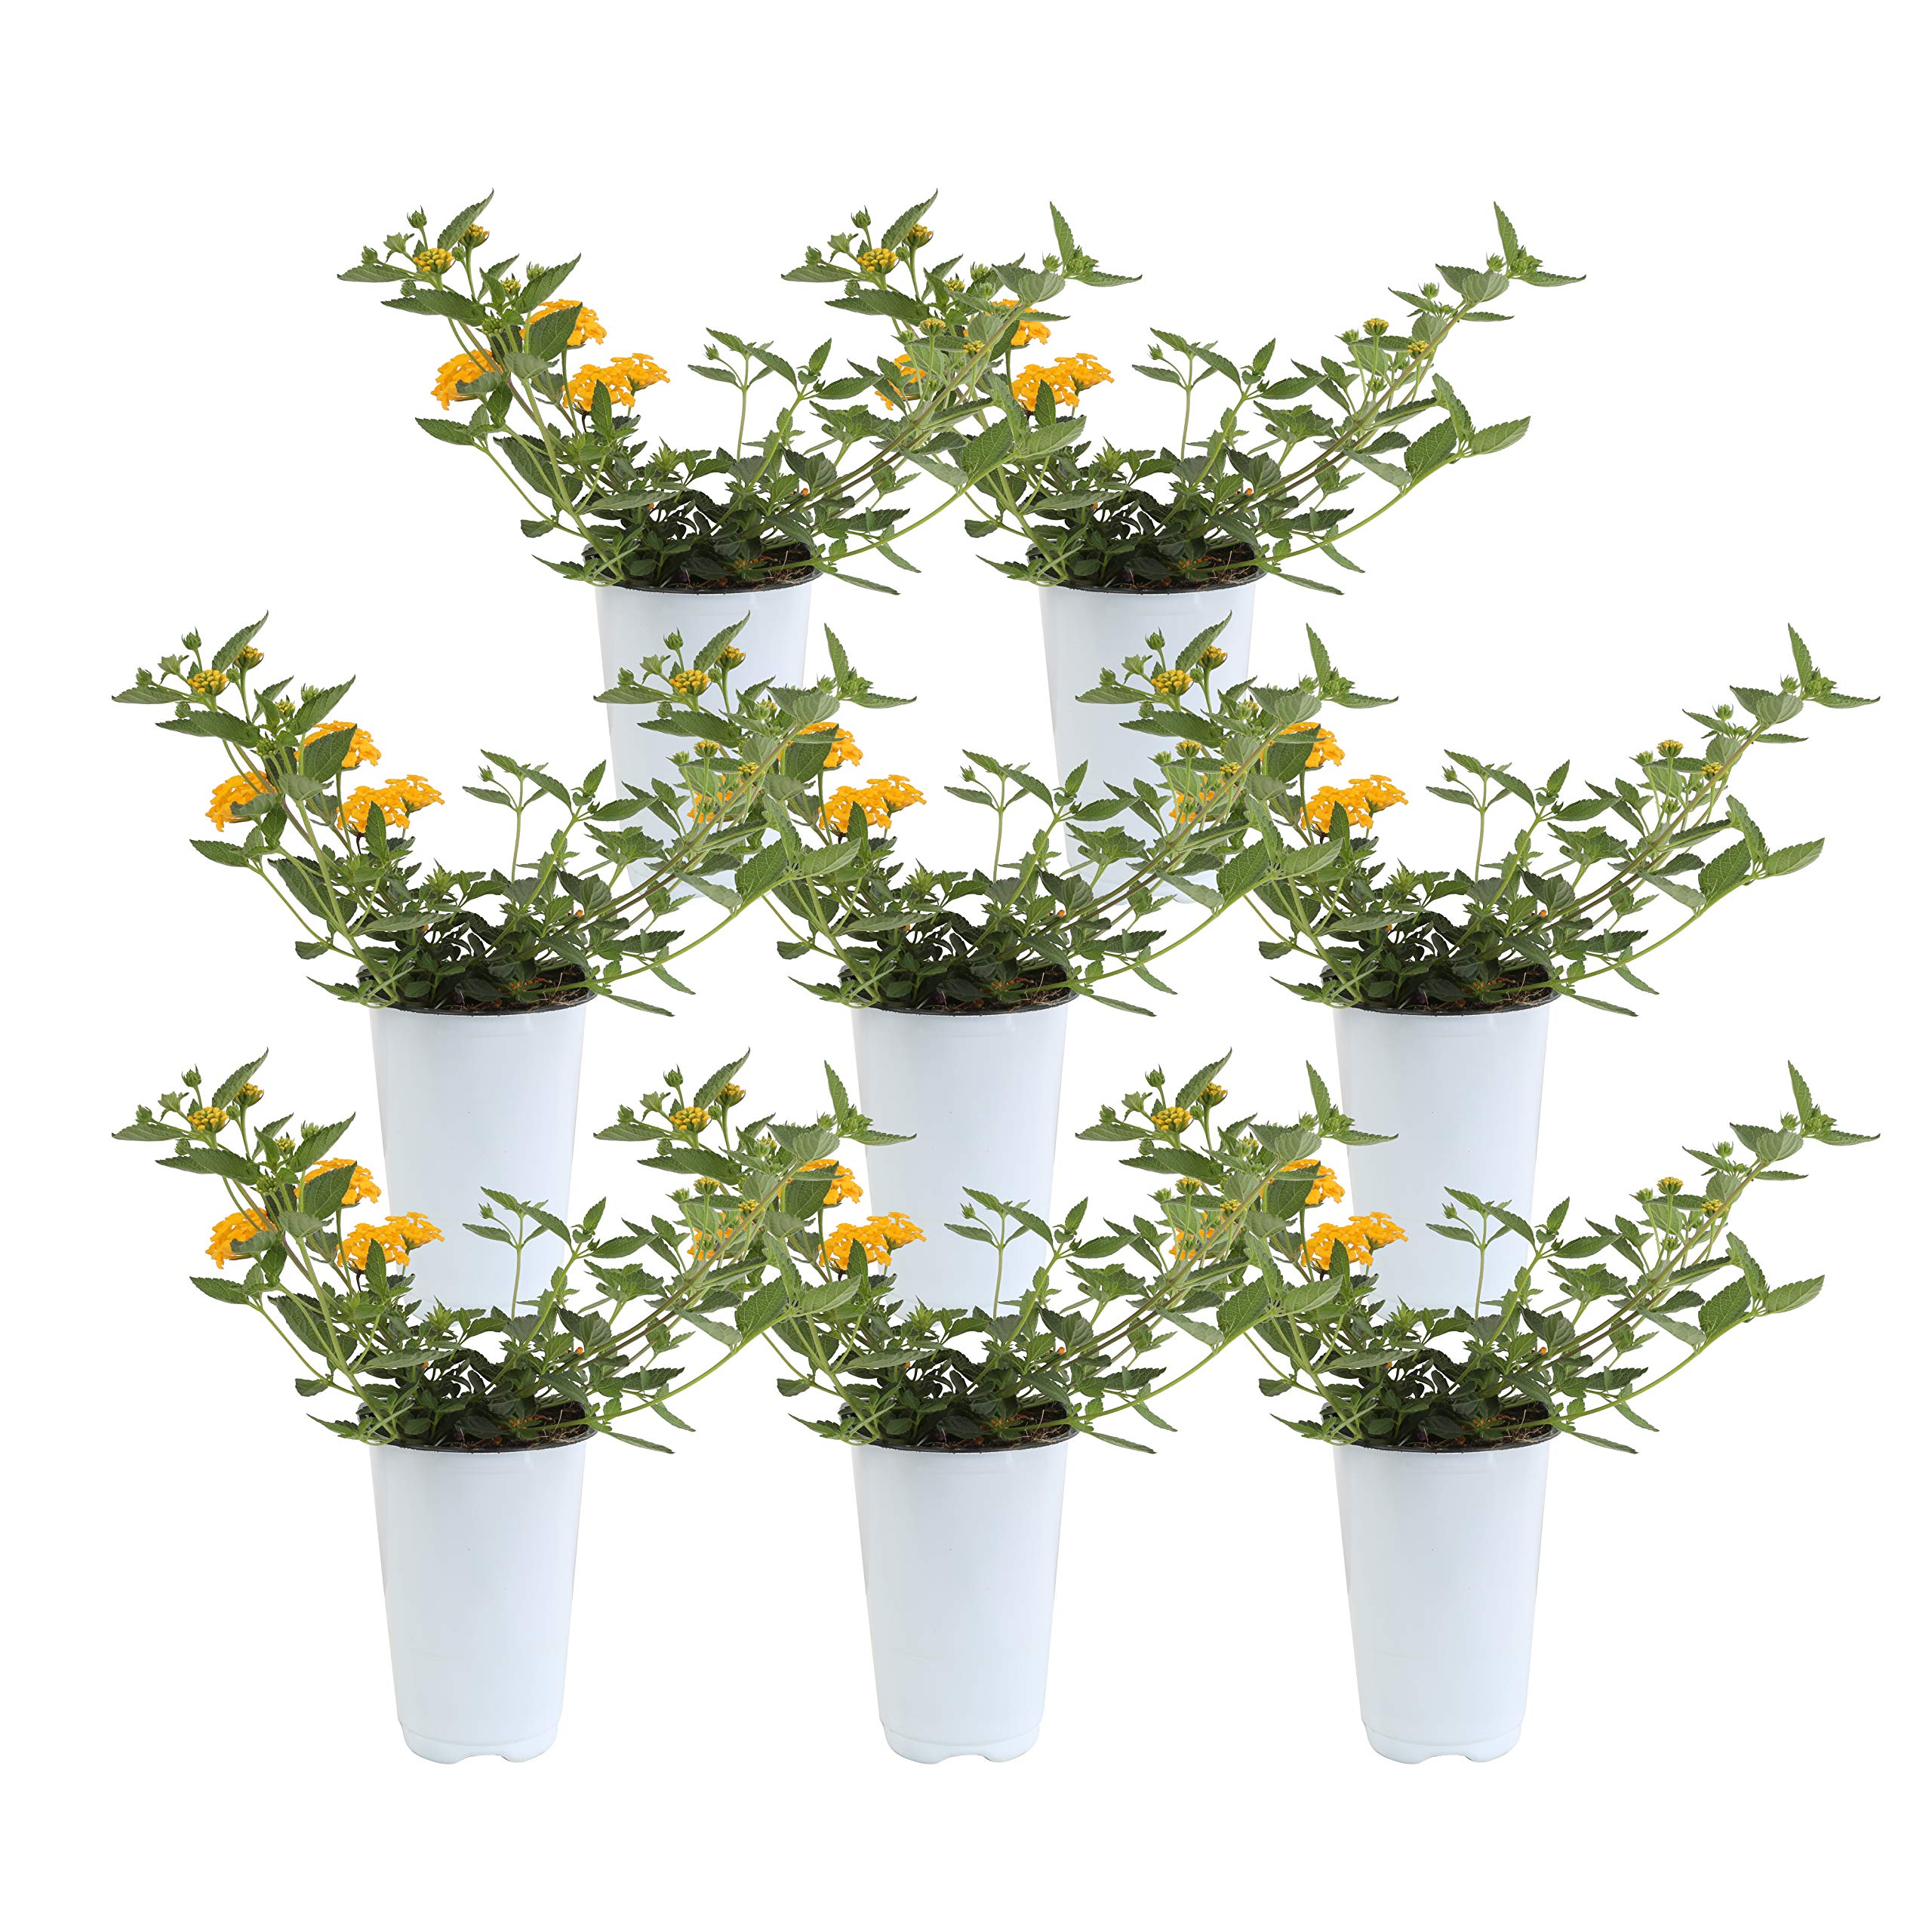 Costa Farms Live Premium Lantana Plant 1.00 qt Grower Pot, 8-Pack Yellow